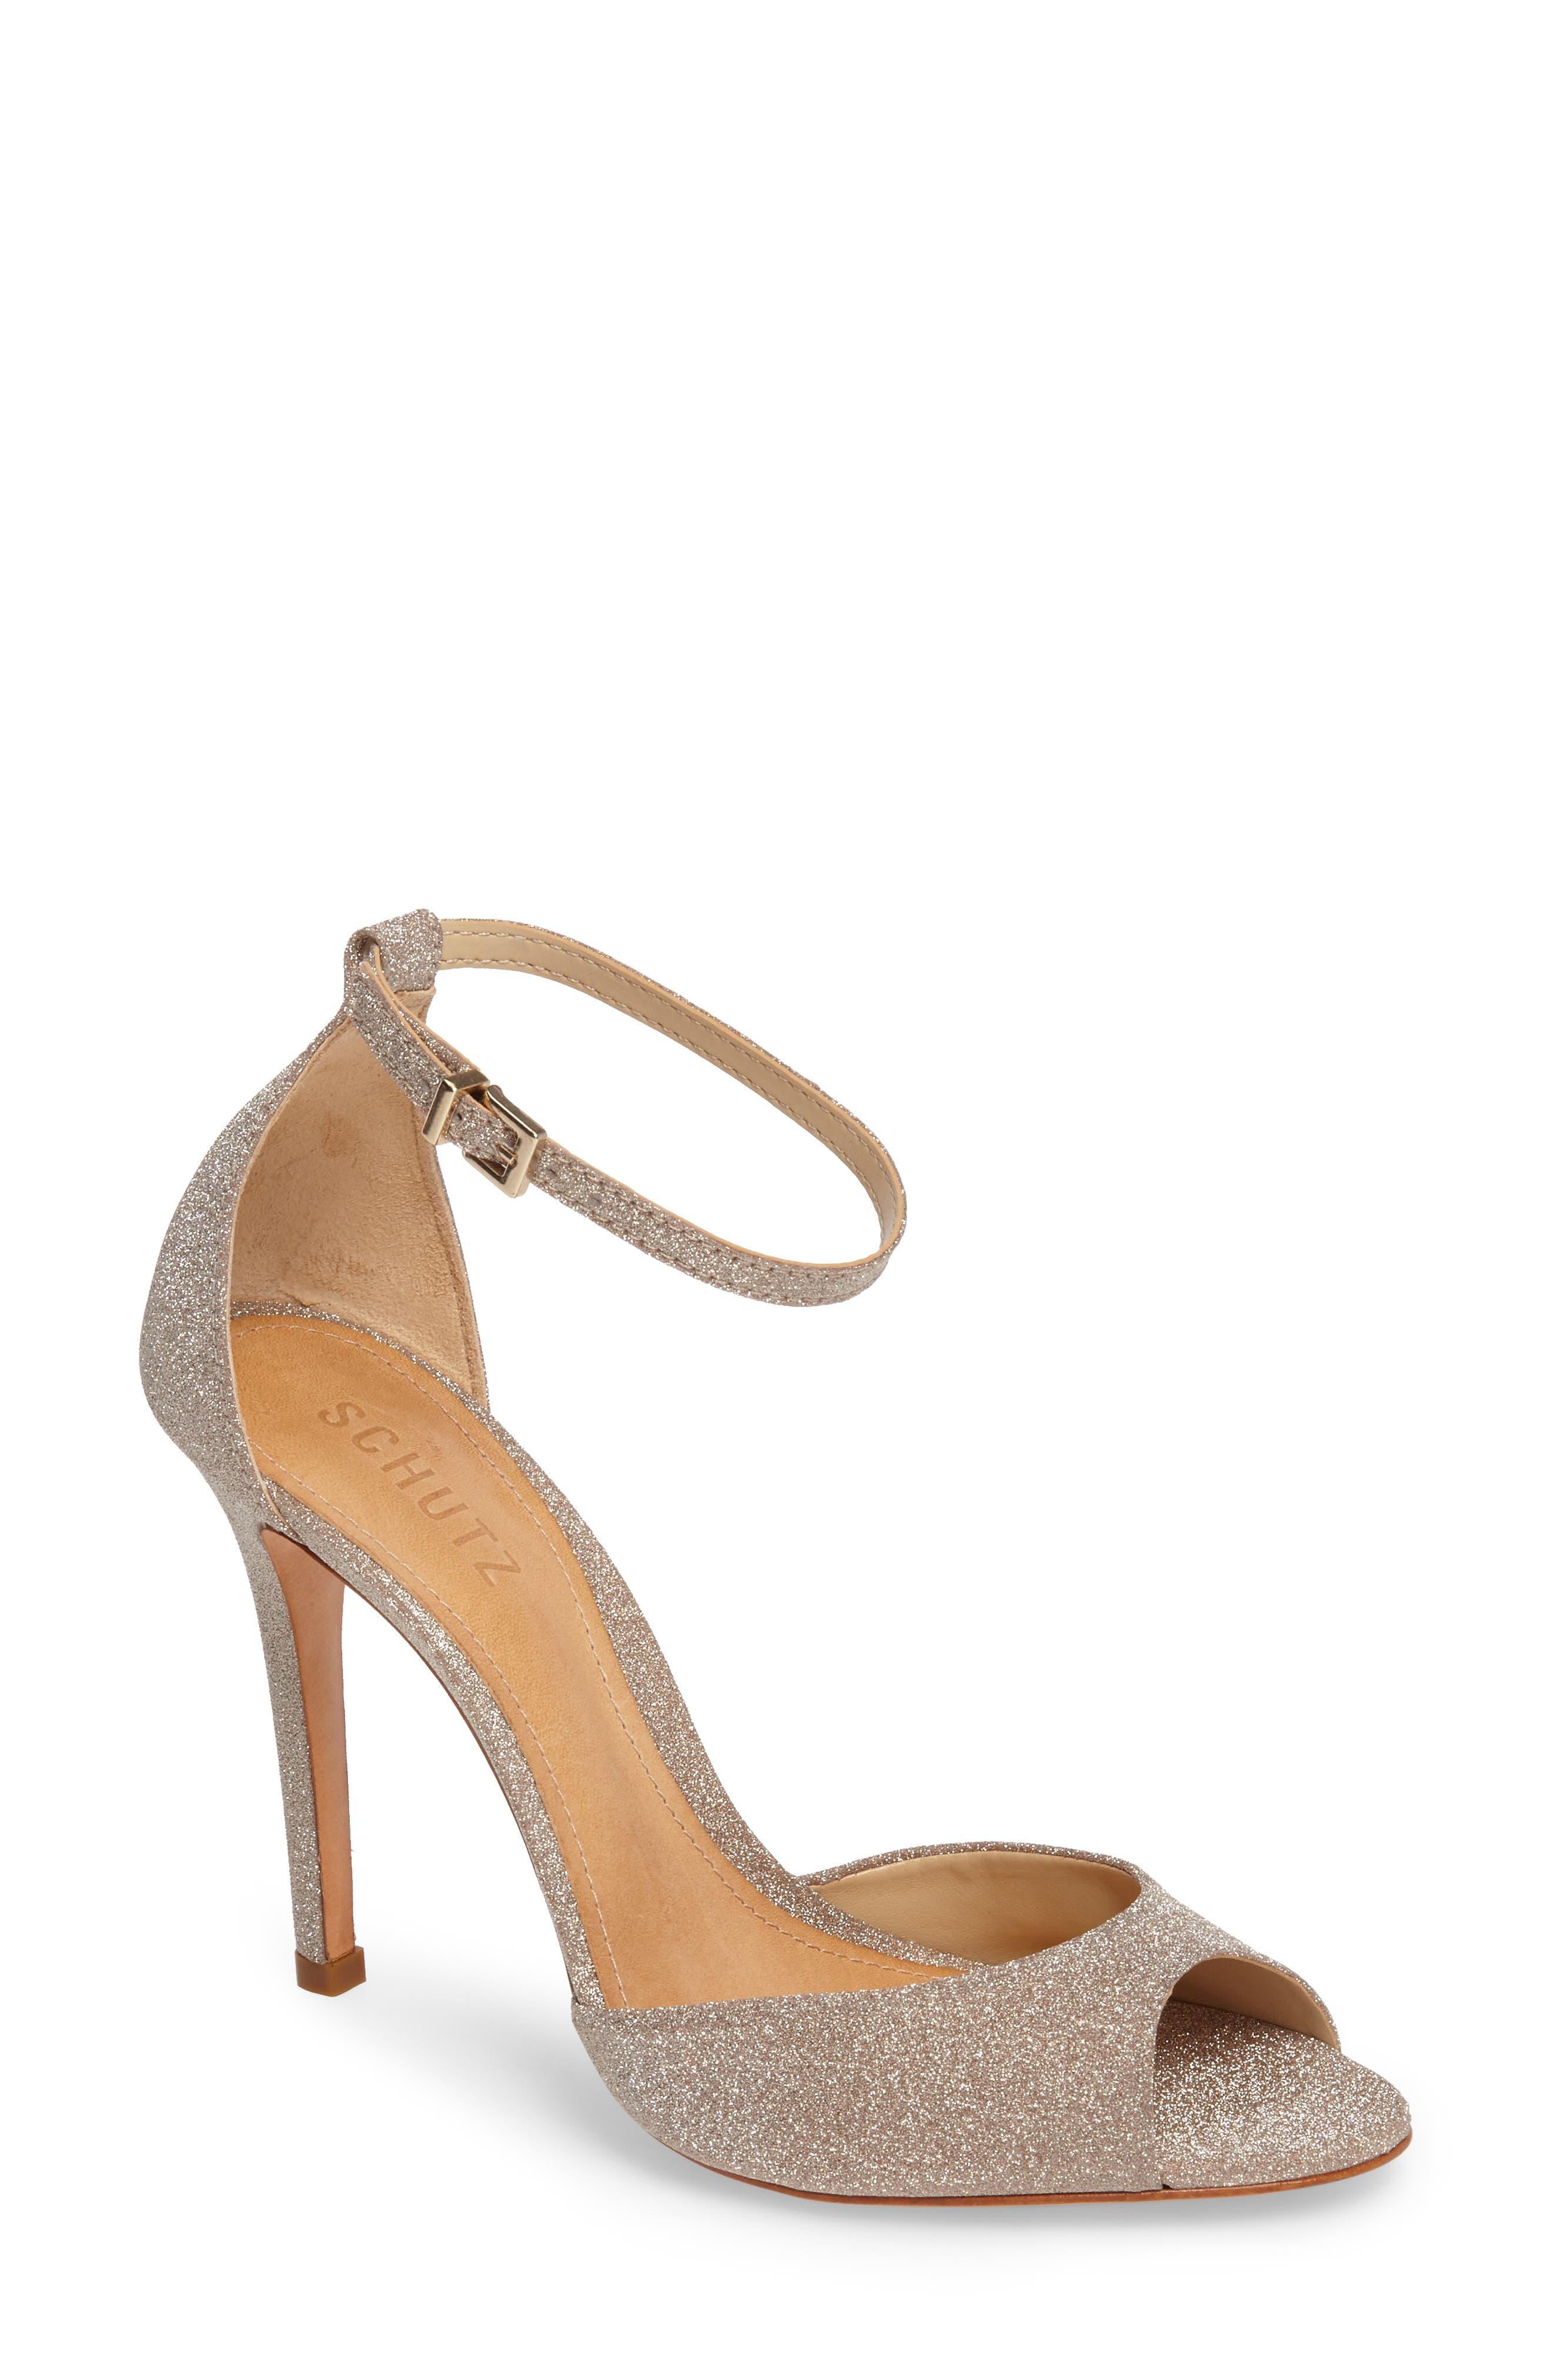 Saasha Lee Ankle Strap Sandal,                             Main thumbnail 1, color,                             040